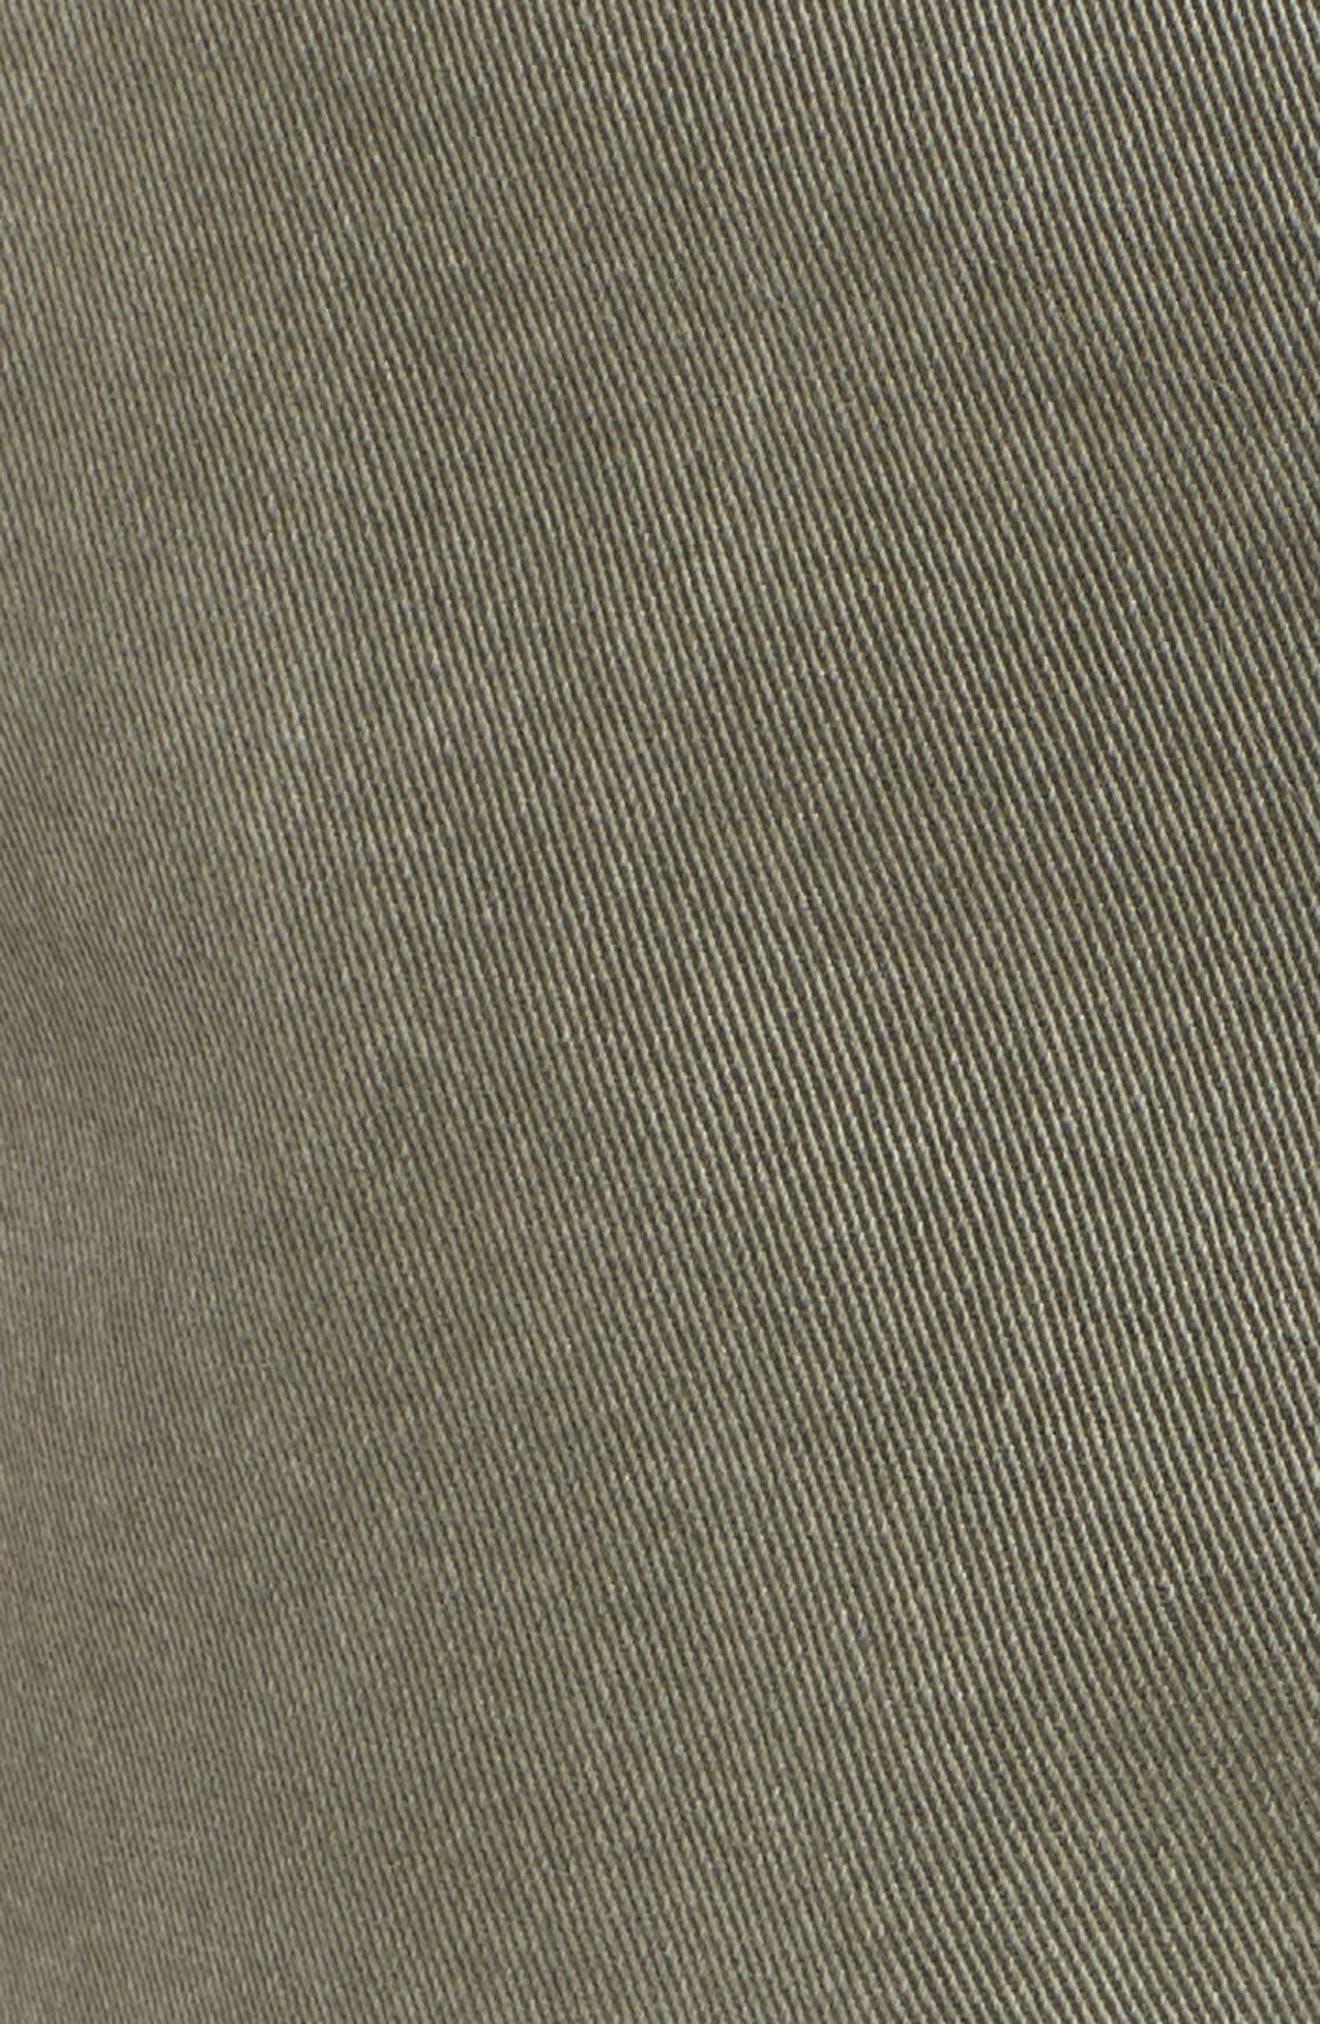 Uniform Stripe Stem Hem Pants,                             Alternate thumbnail 6, color,                             Militia